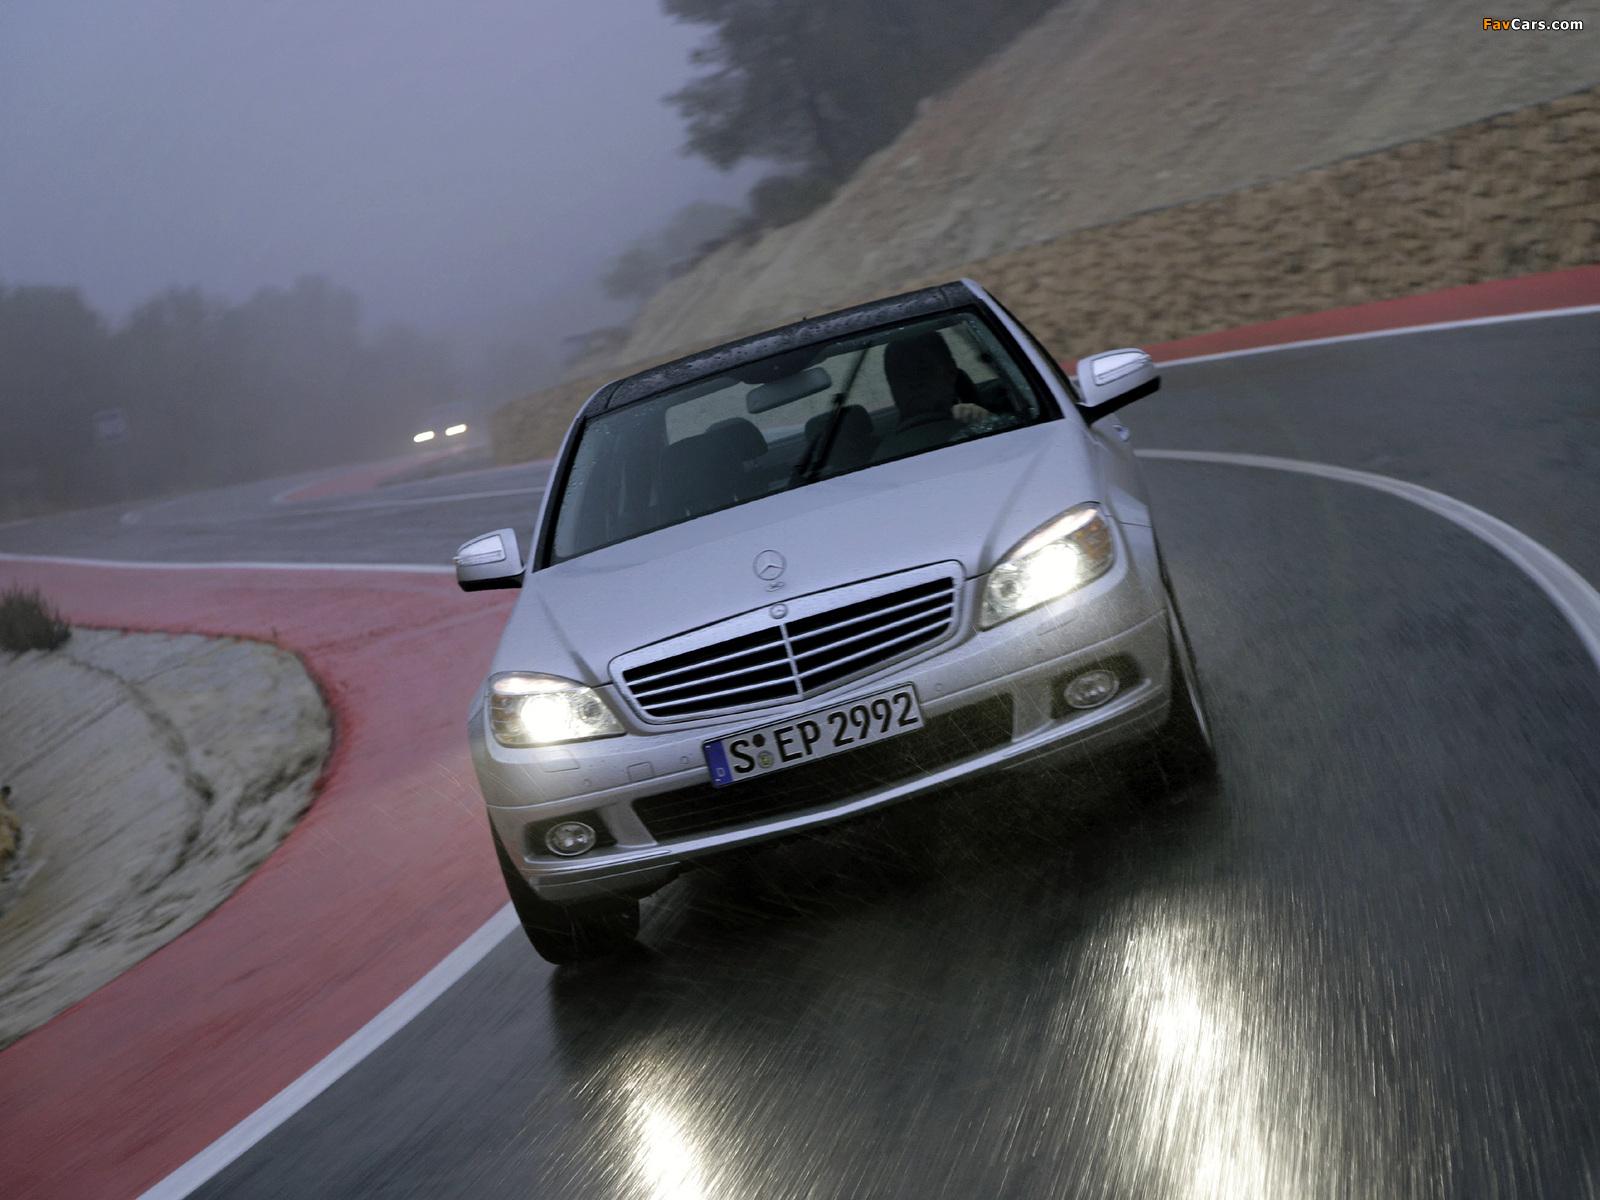 Mercedes-Benz C 350 4MATIC (W204) 2007–11 wallpapers (1600 x 1200)